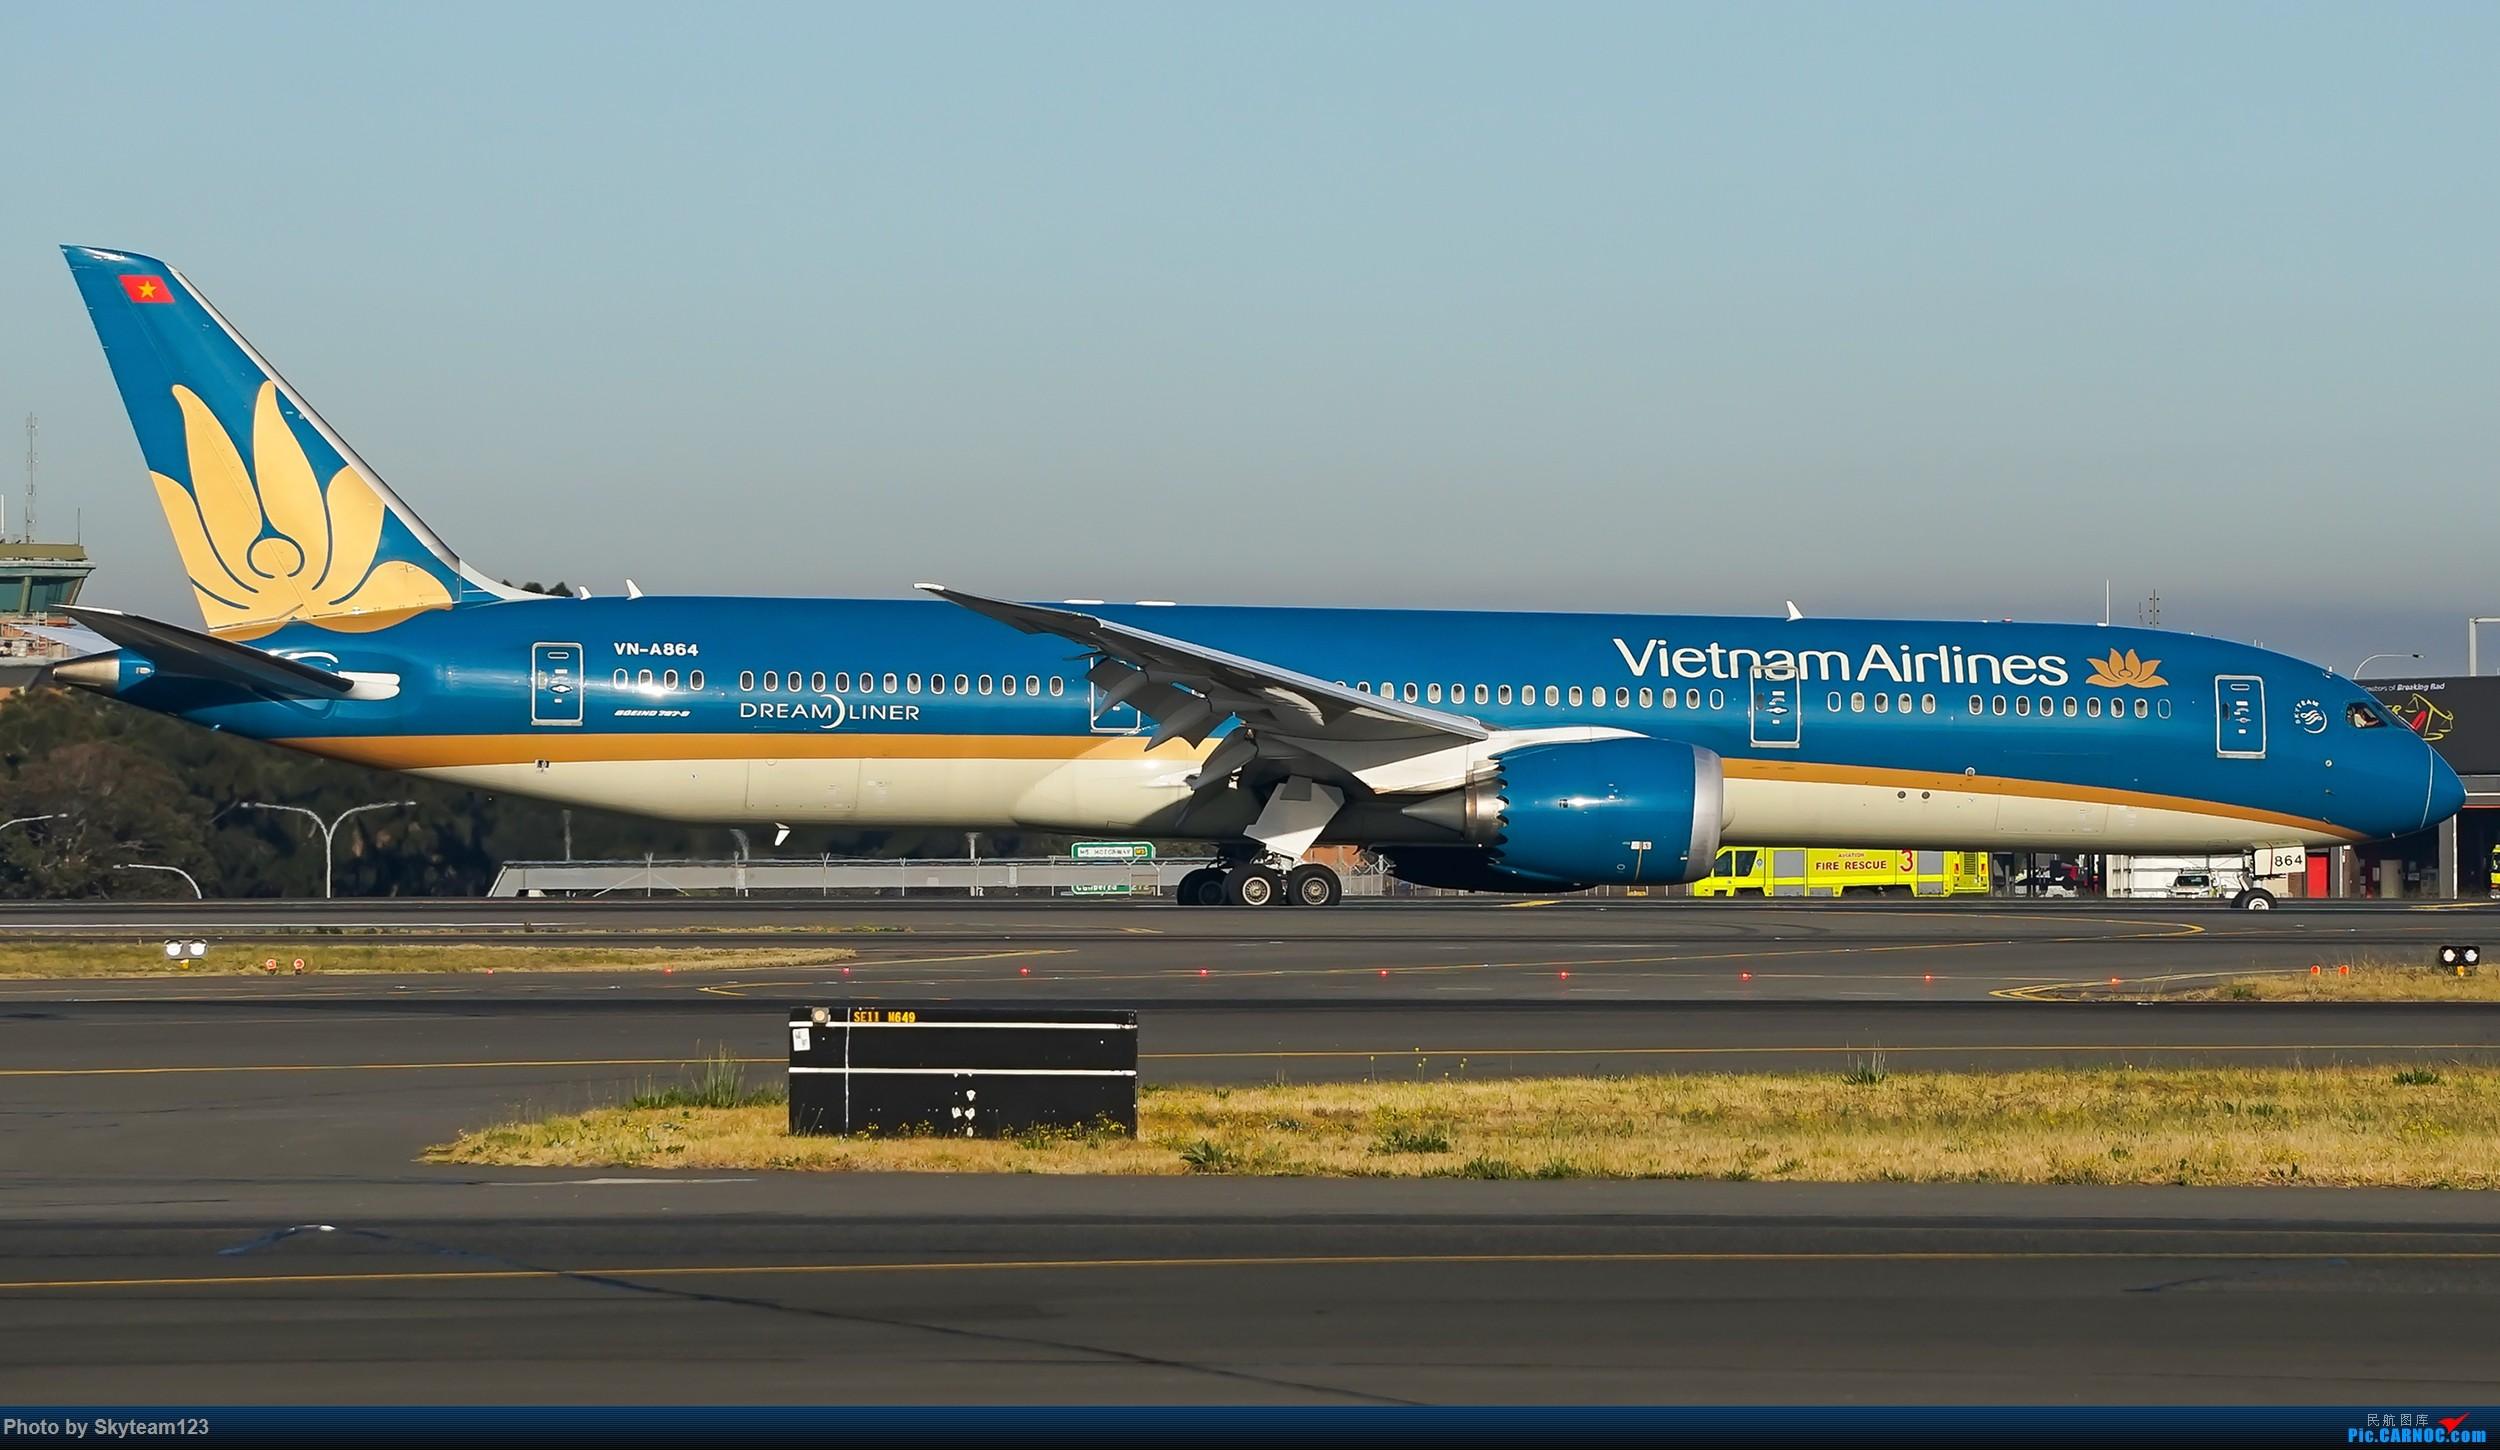 Re:[原创][SYD] 再访Blu EMU停车场 早上34L抵港出发杂图几张 BOEING 787-9 VN-A864 澳大利亚悉尼金斯福德·史密斯机场